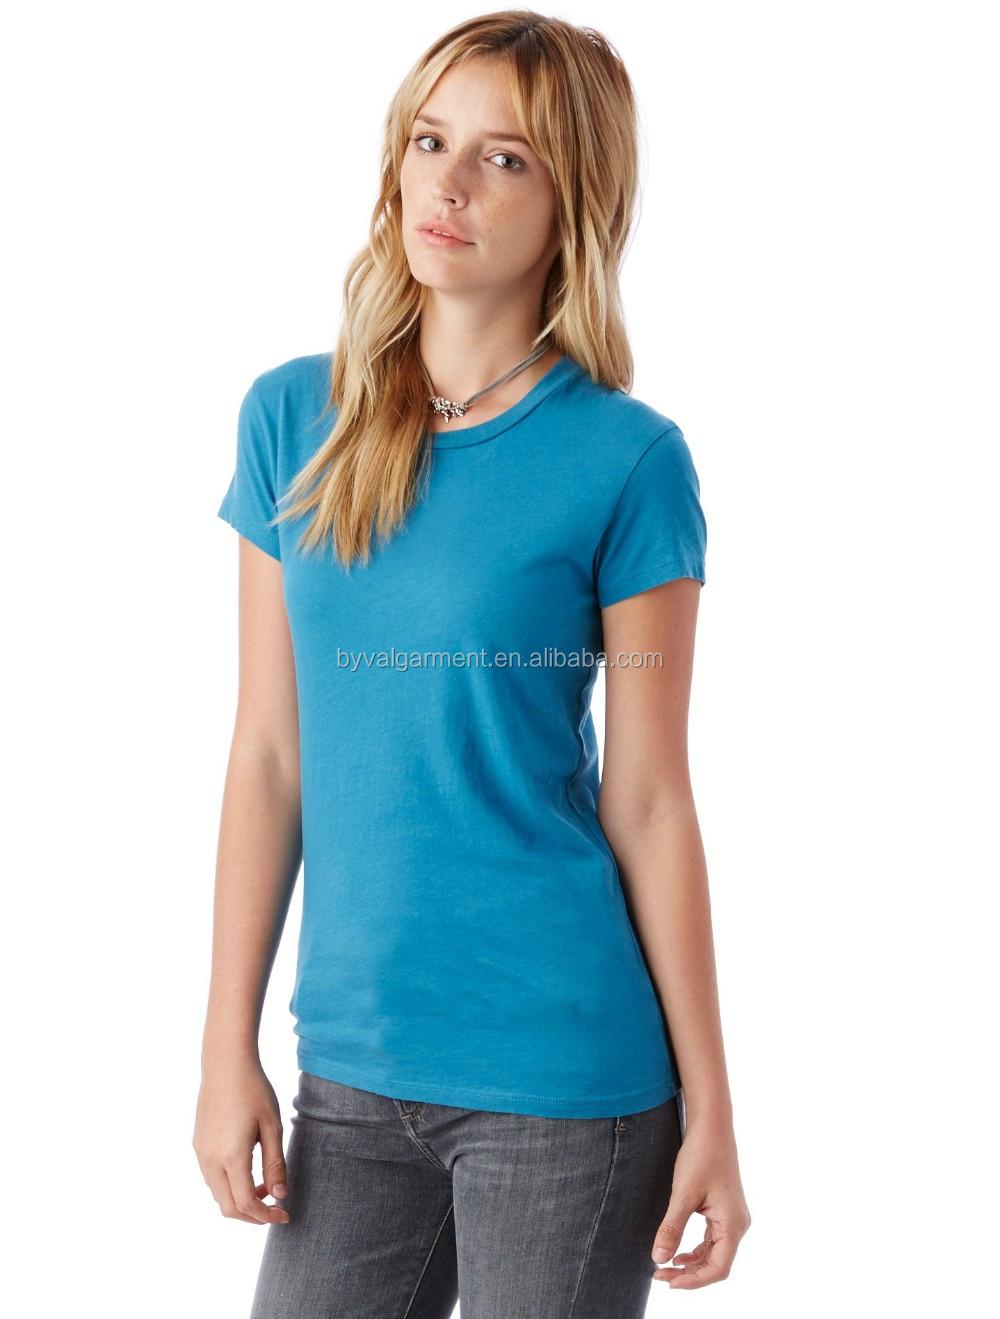 100% organic cotton Bulk plain t-shirts for women (7).jpg